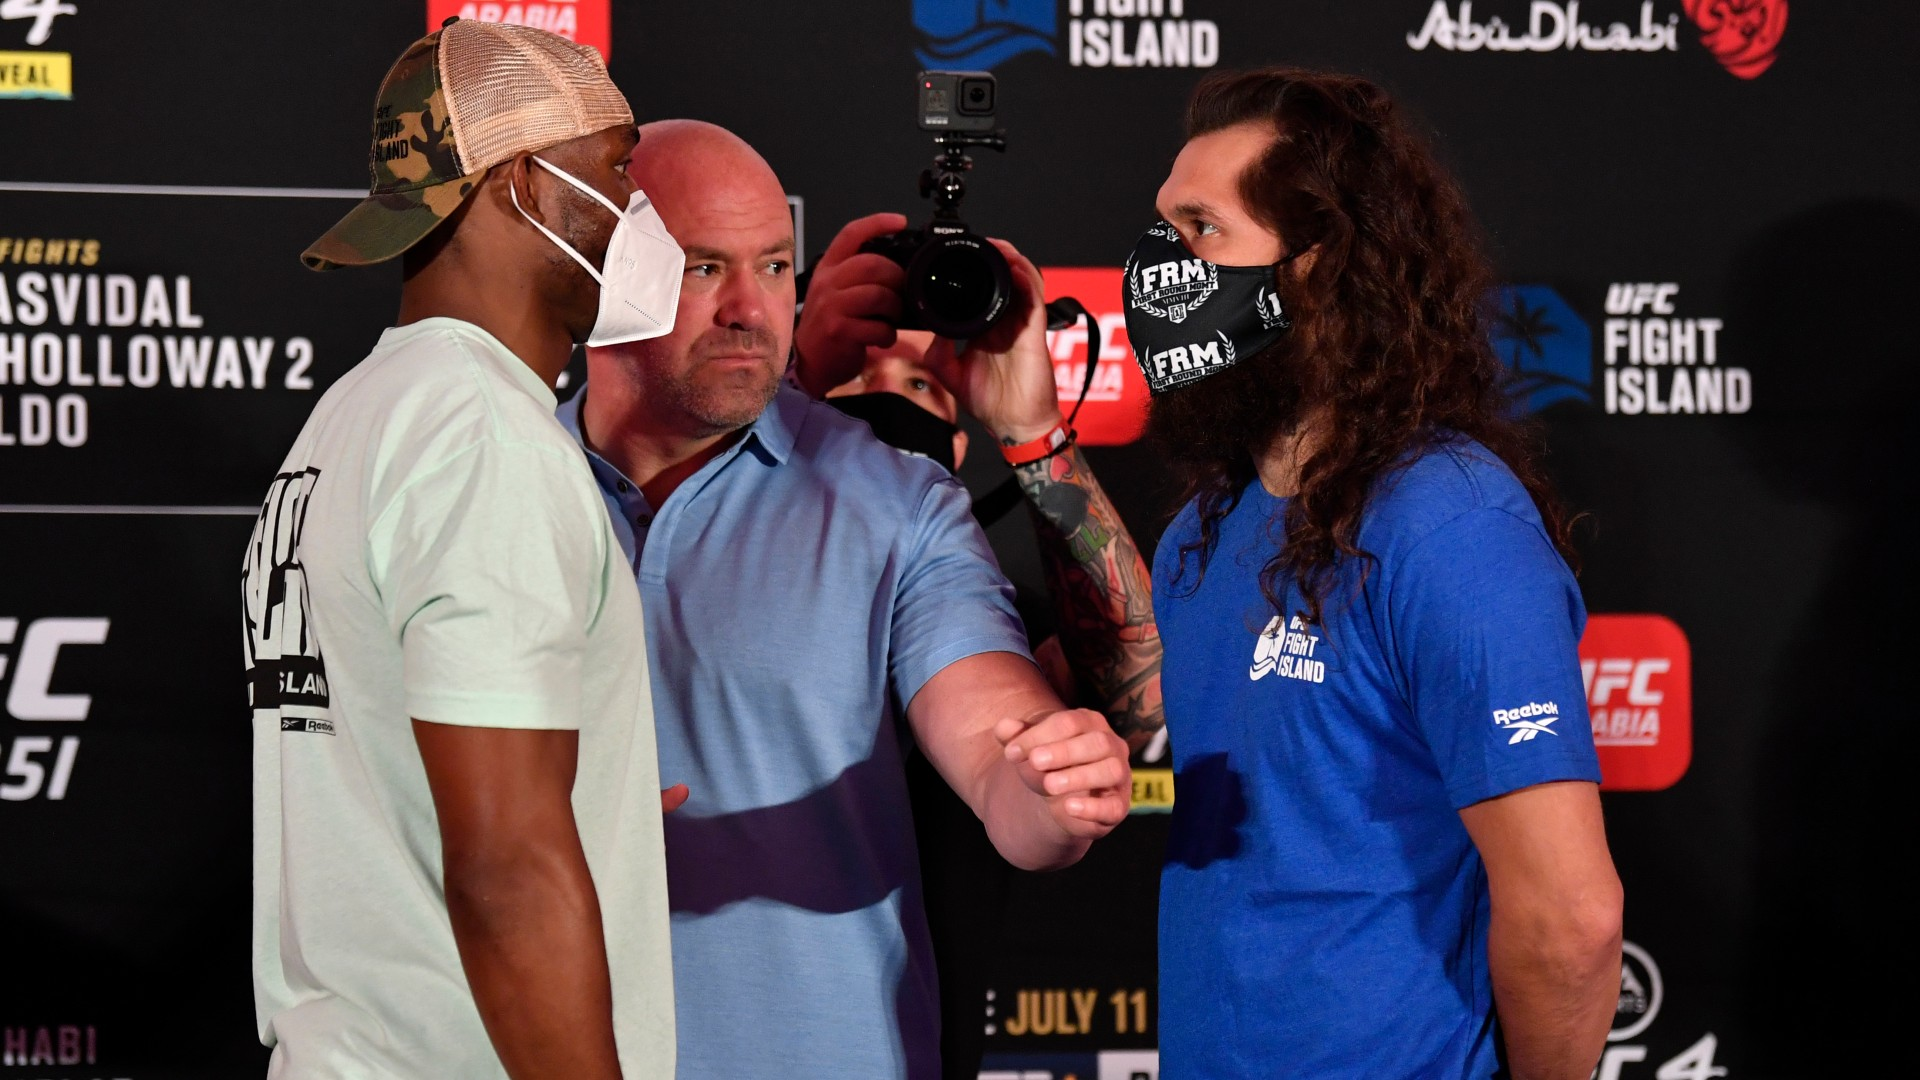 UFC 261 live fight updates, results, highlights from Kamaru Usman vs. Jorge Masvidal 2